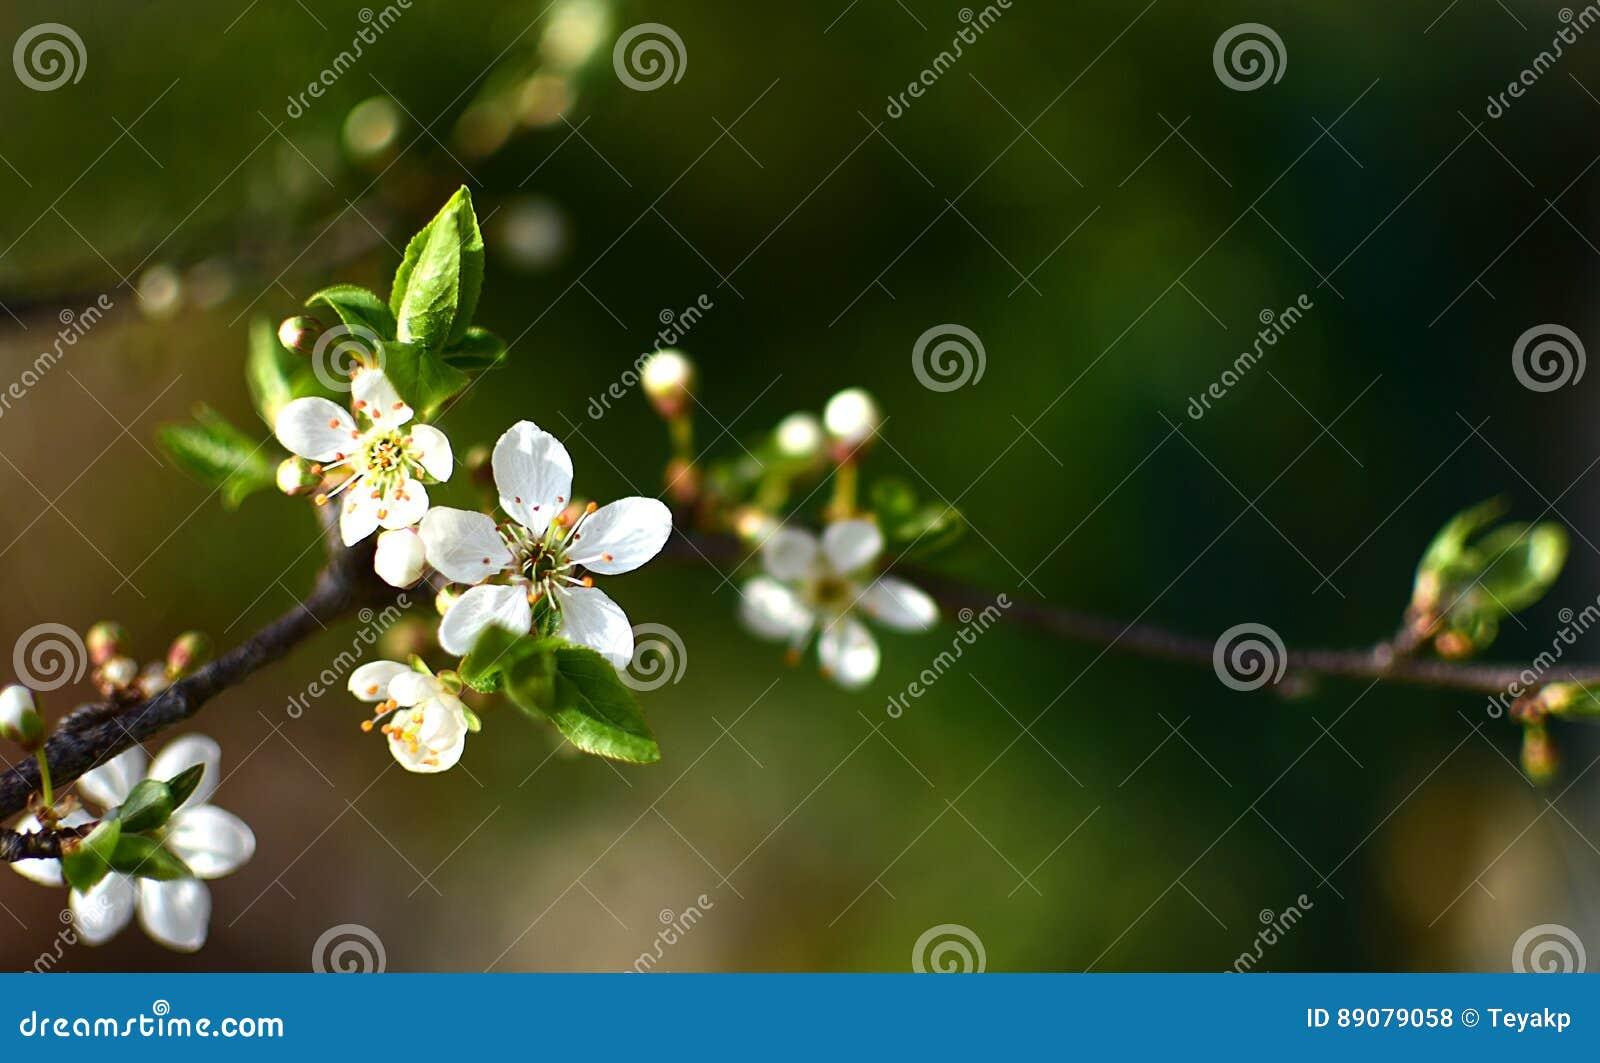 Wild plum tree in full bloom